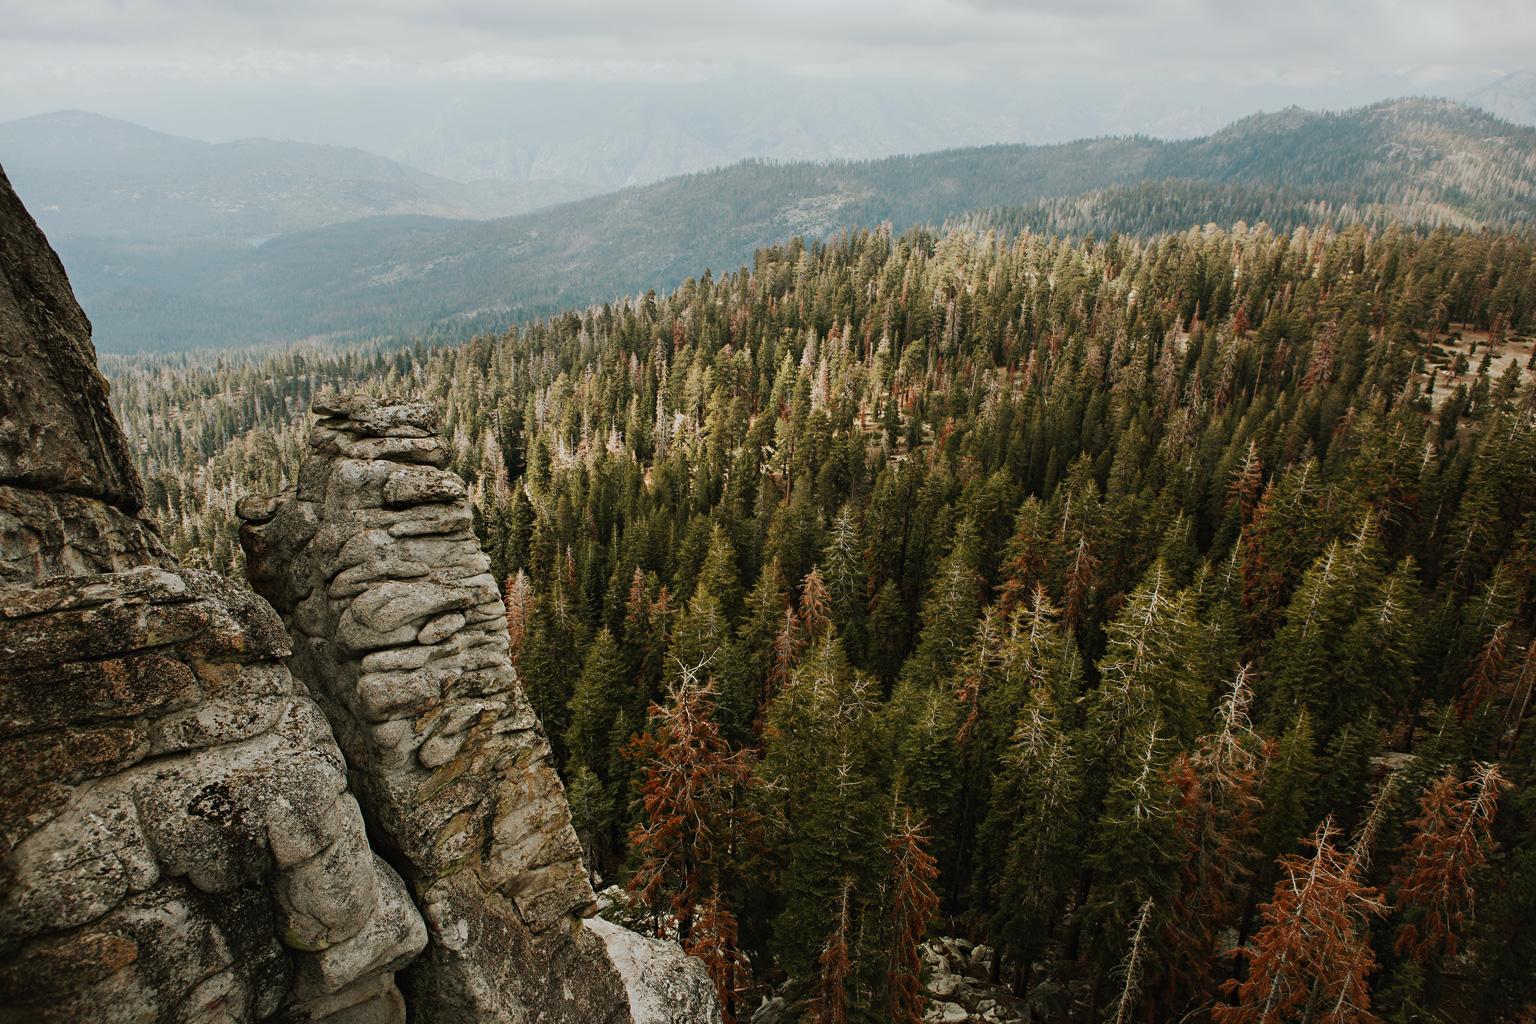 CindyGiovagnoli_Kings_Canyon_National_Park_hike_firetower_lookout_sunset-005.jpg